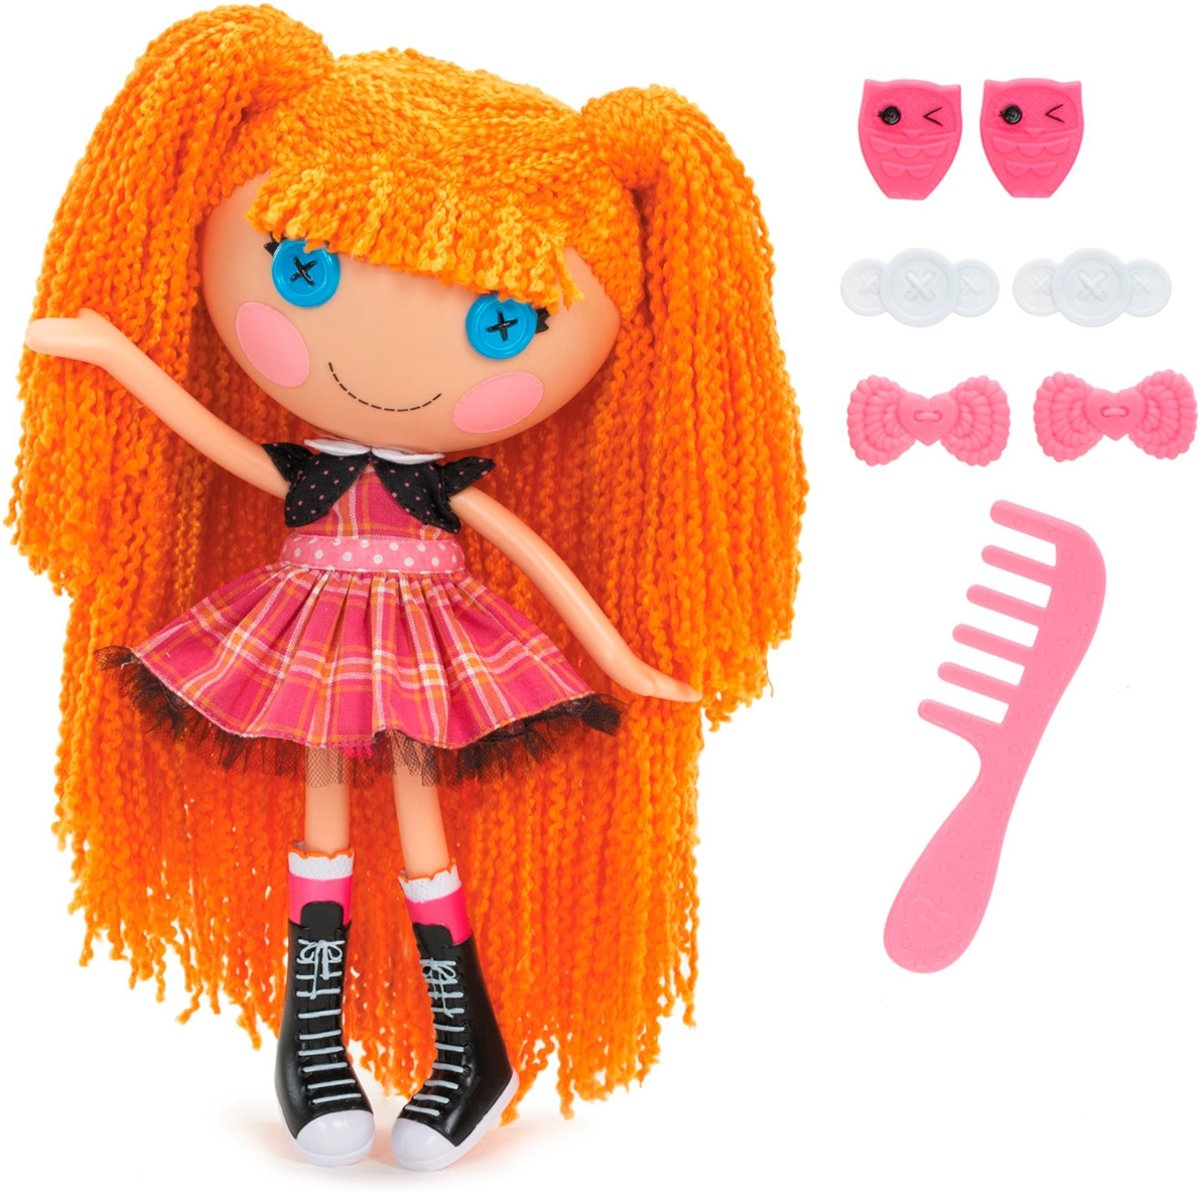 Lalaloopsy Loopy Hair Bea Spells-a-Lot - Pop